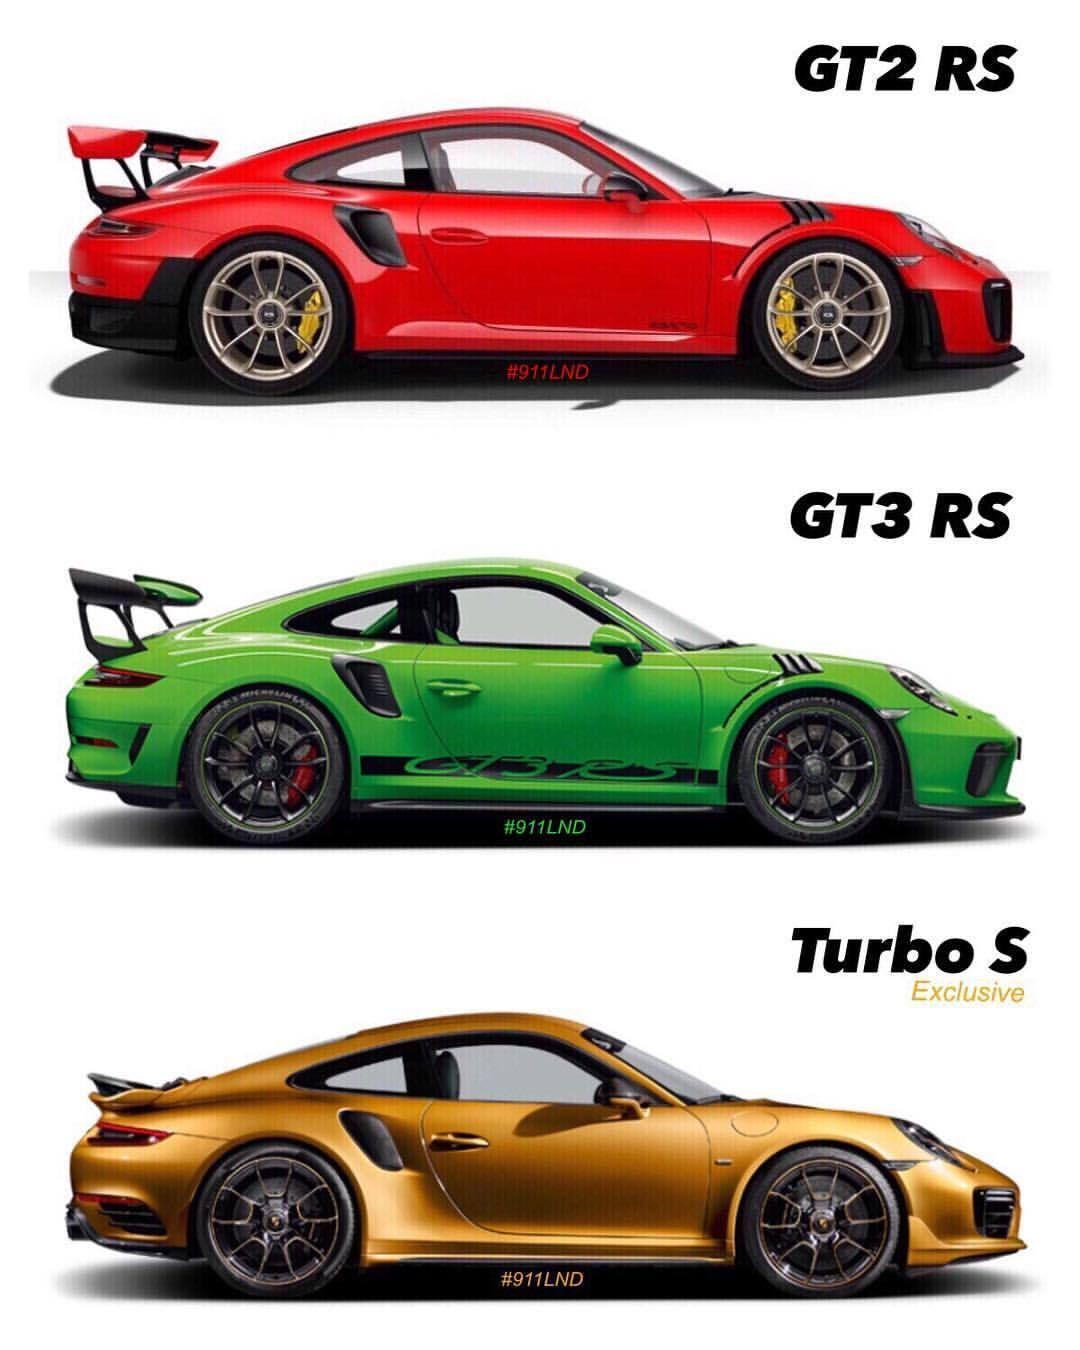 Porsche Porsche Gt Porsche Cars Porsche 911 Gt2